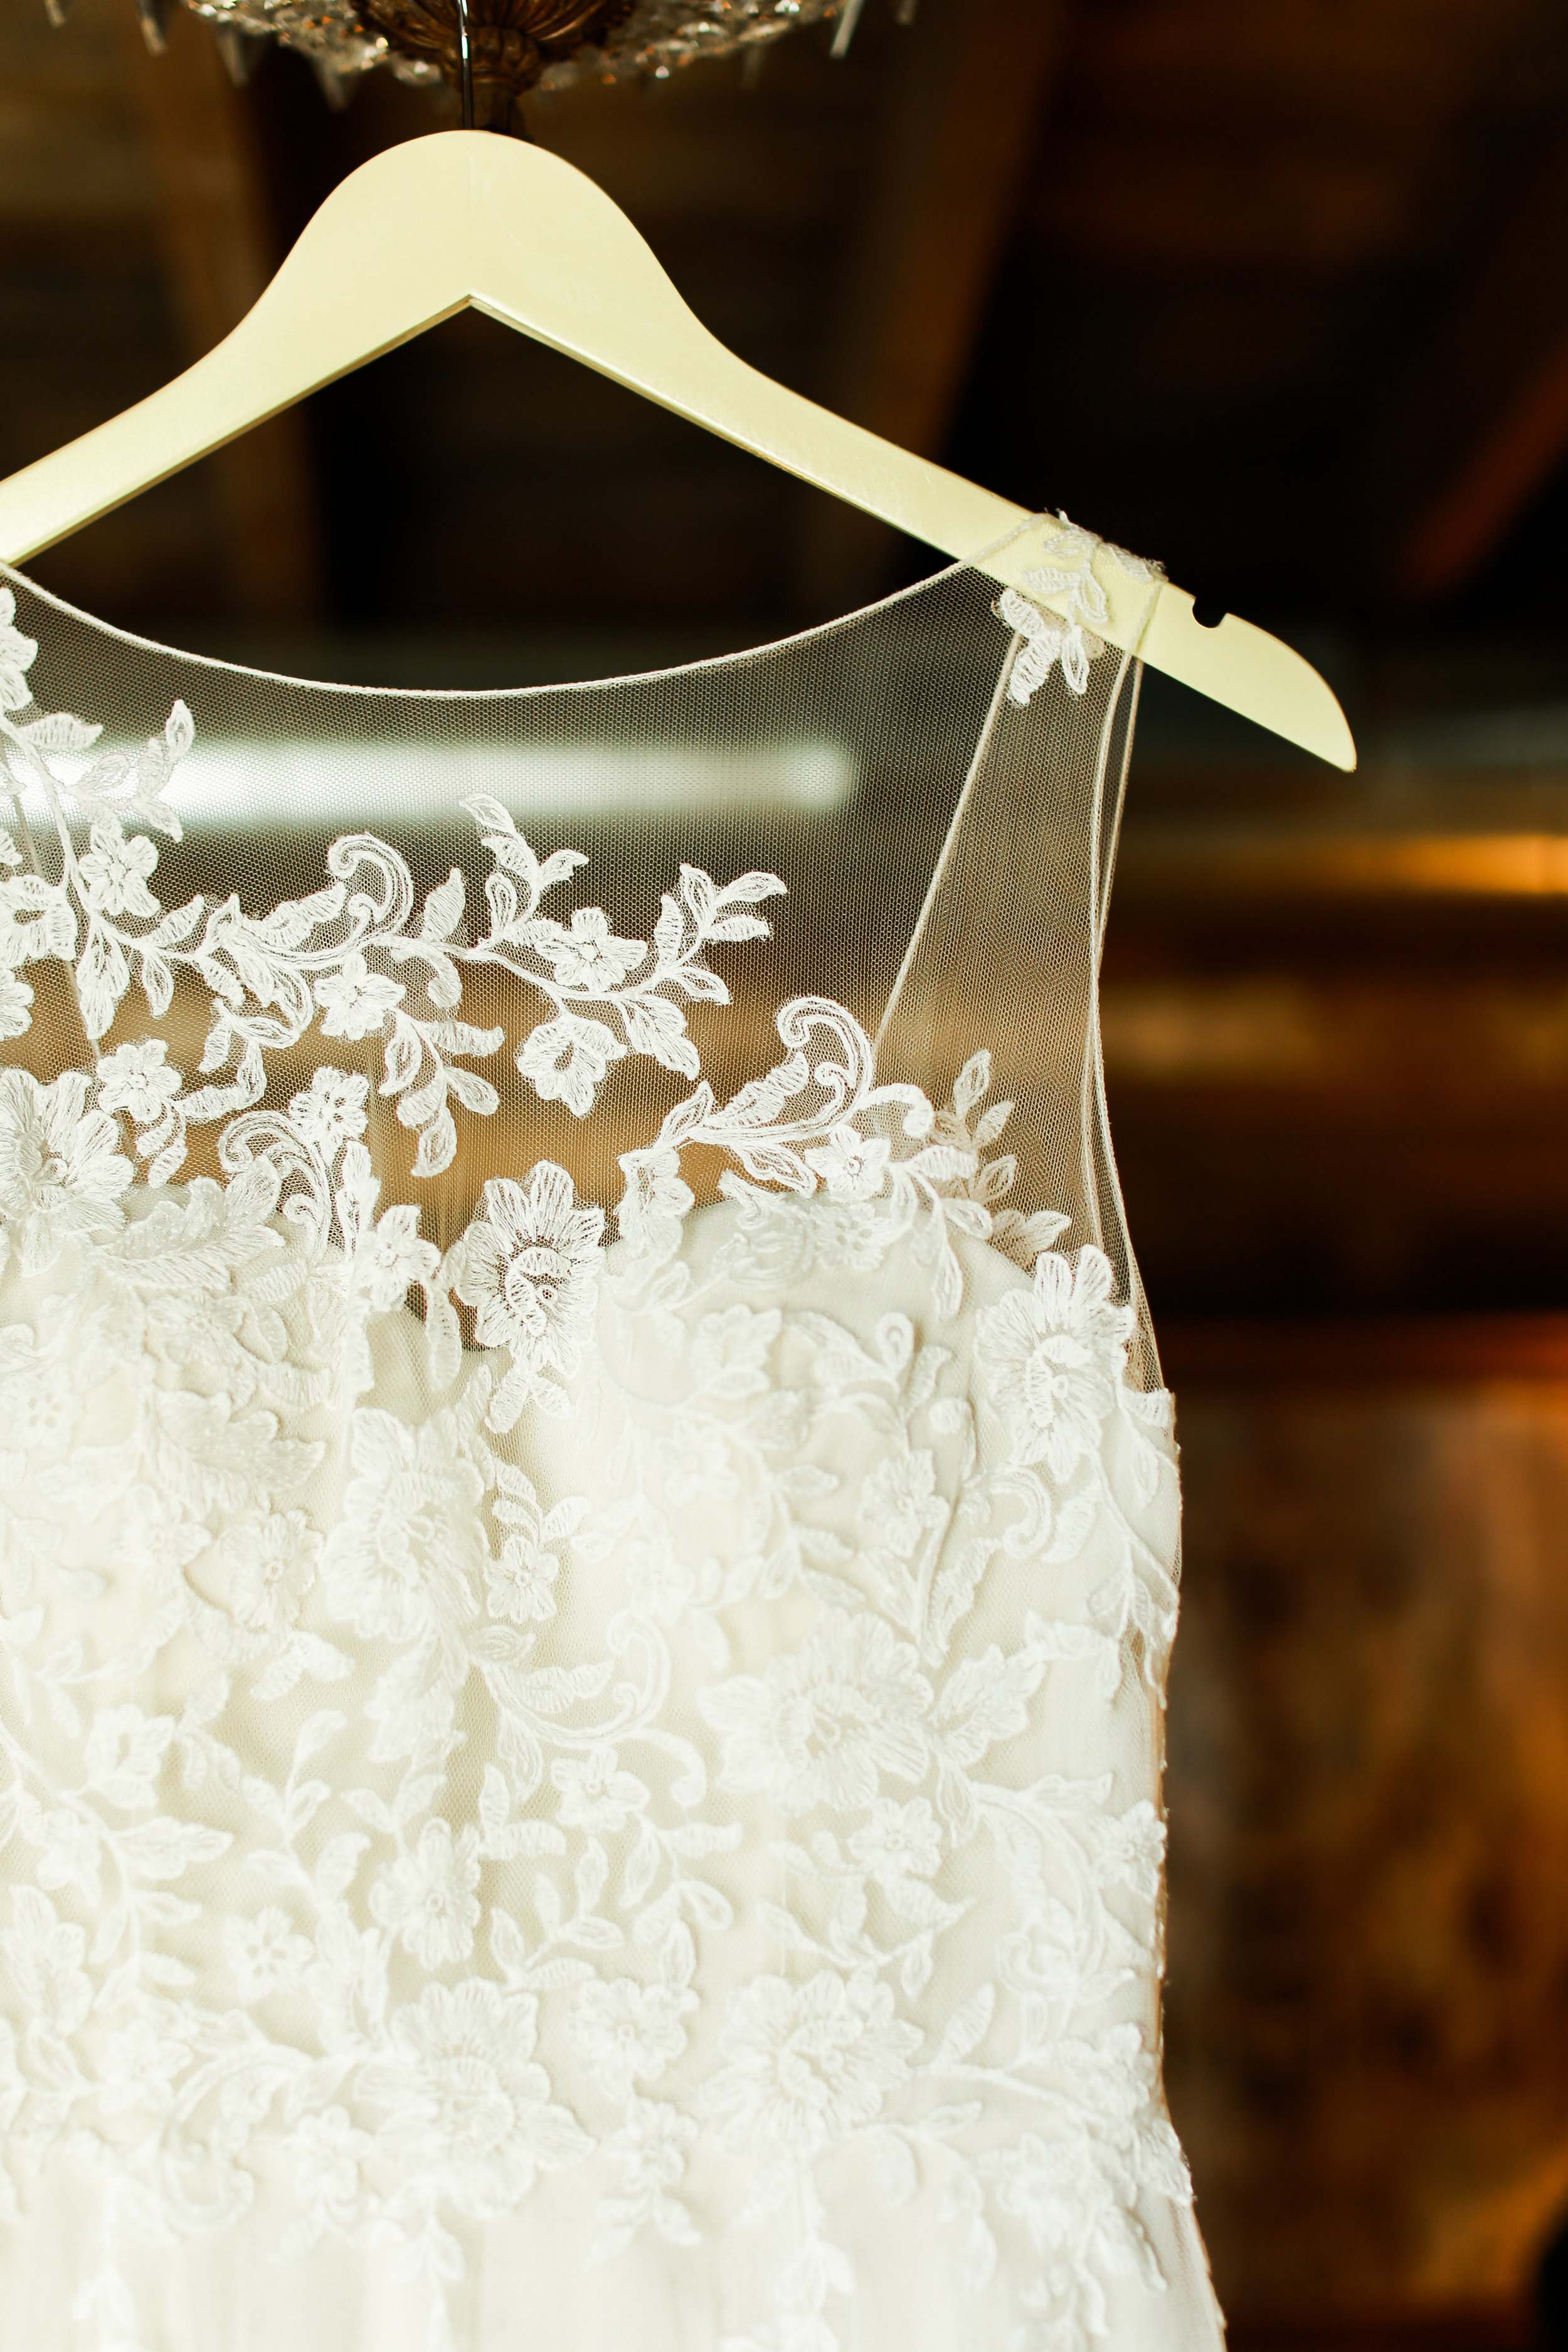 Jenna Kevin Wedding   Hannah Schmitt Photography   Legacy Hill Farm   dress details   lace sheer top wedding  